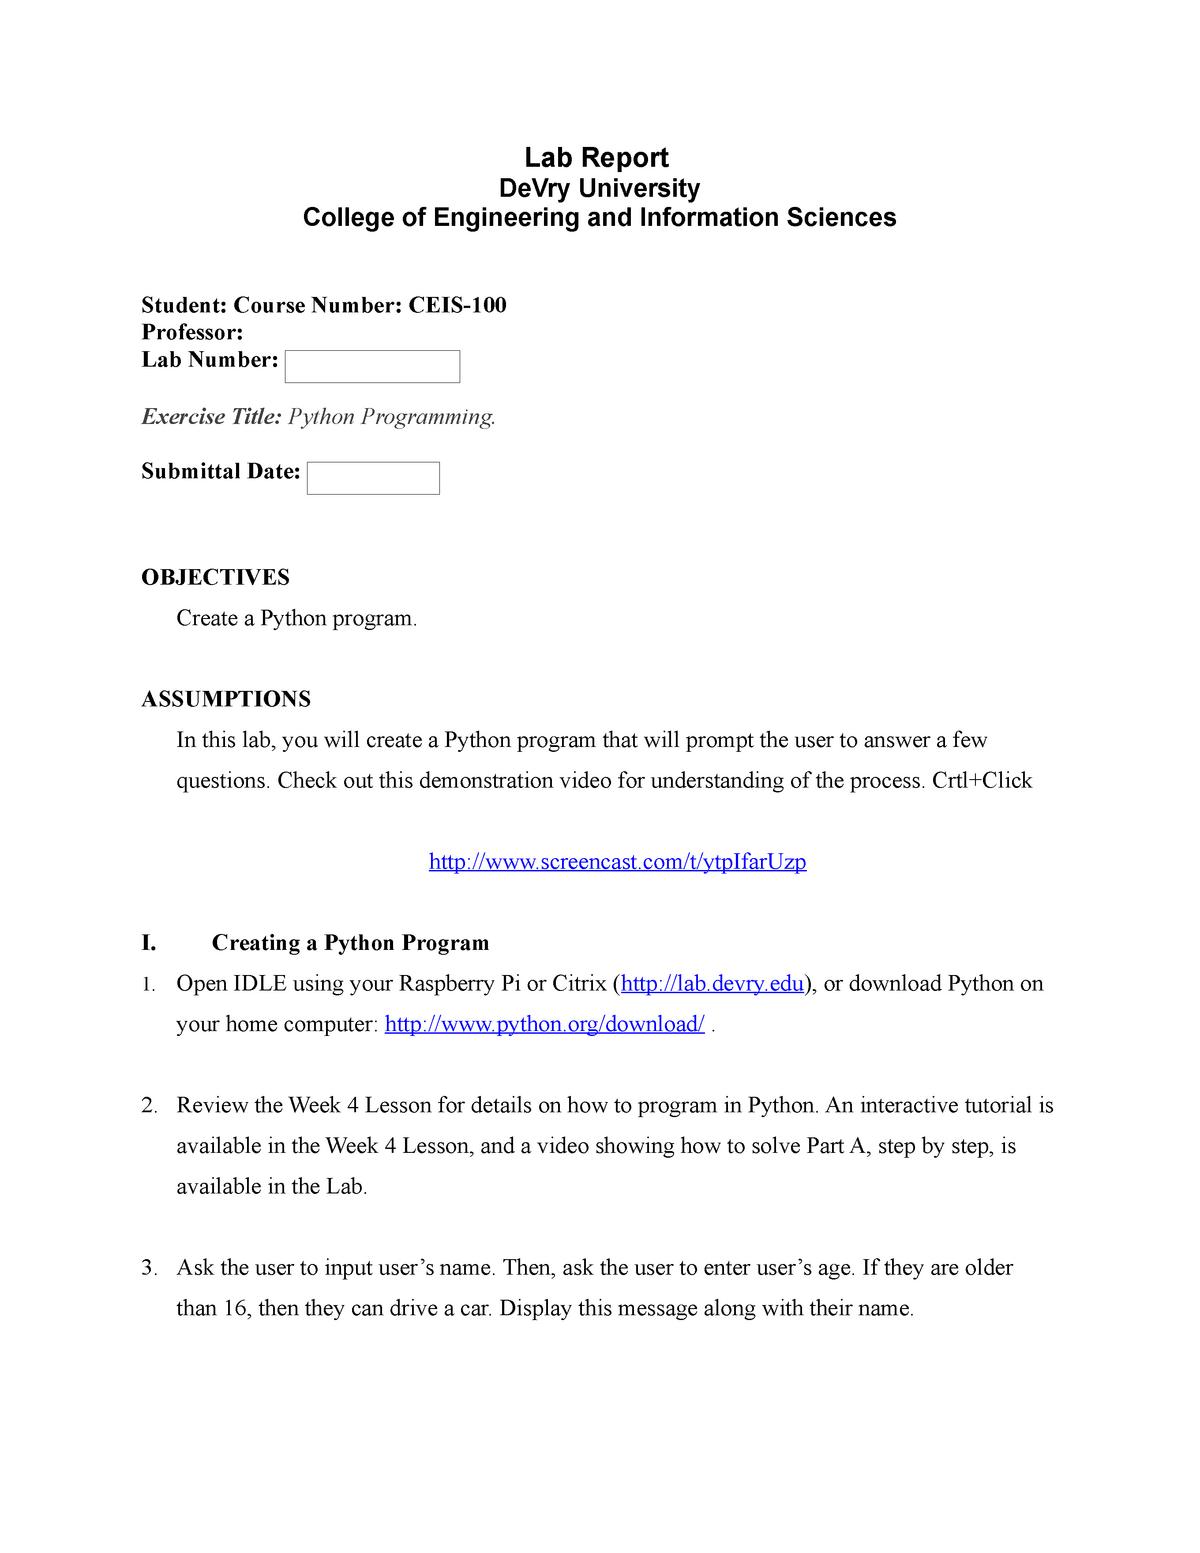 Lab04 - Python Programming  - CEIS100 - StuDocu